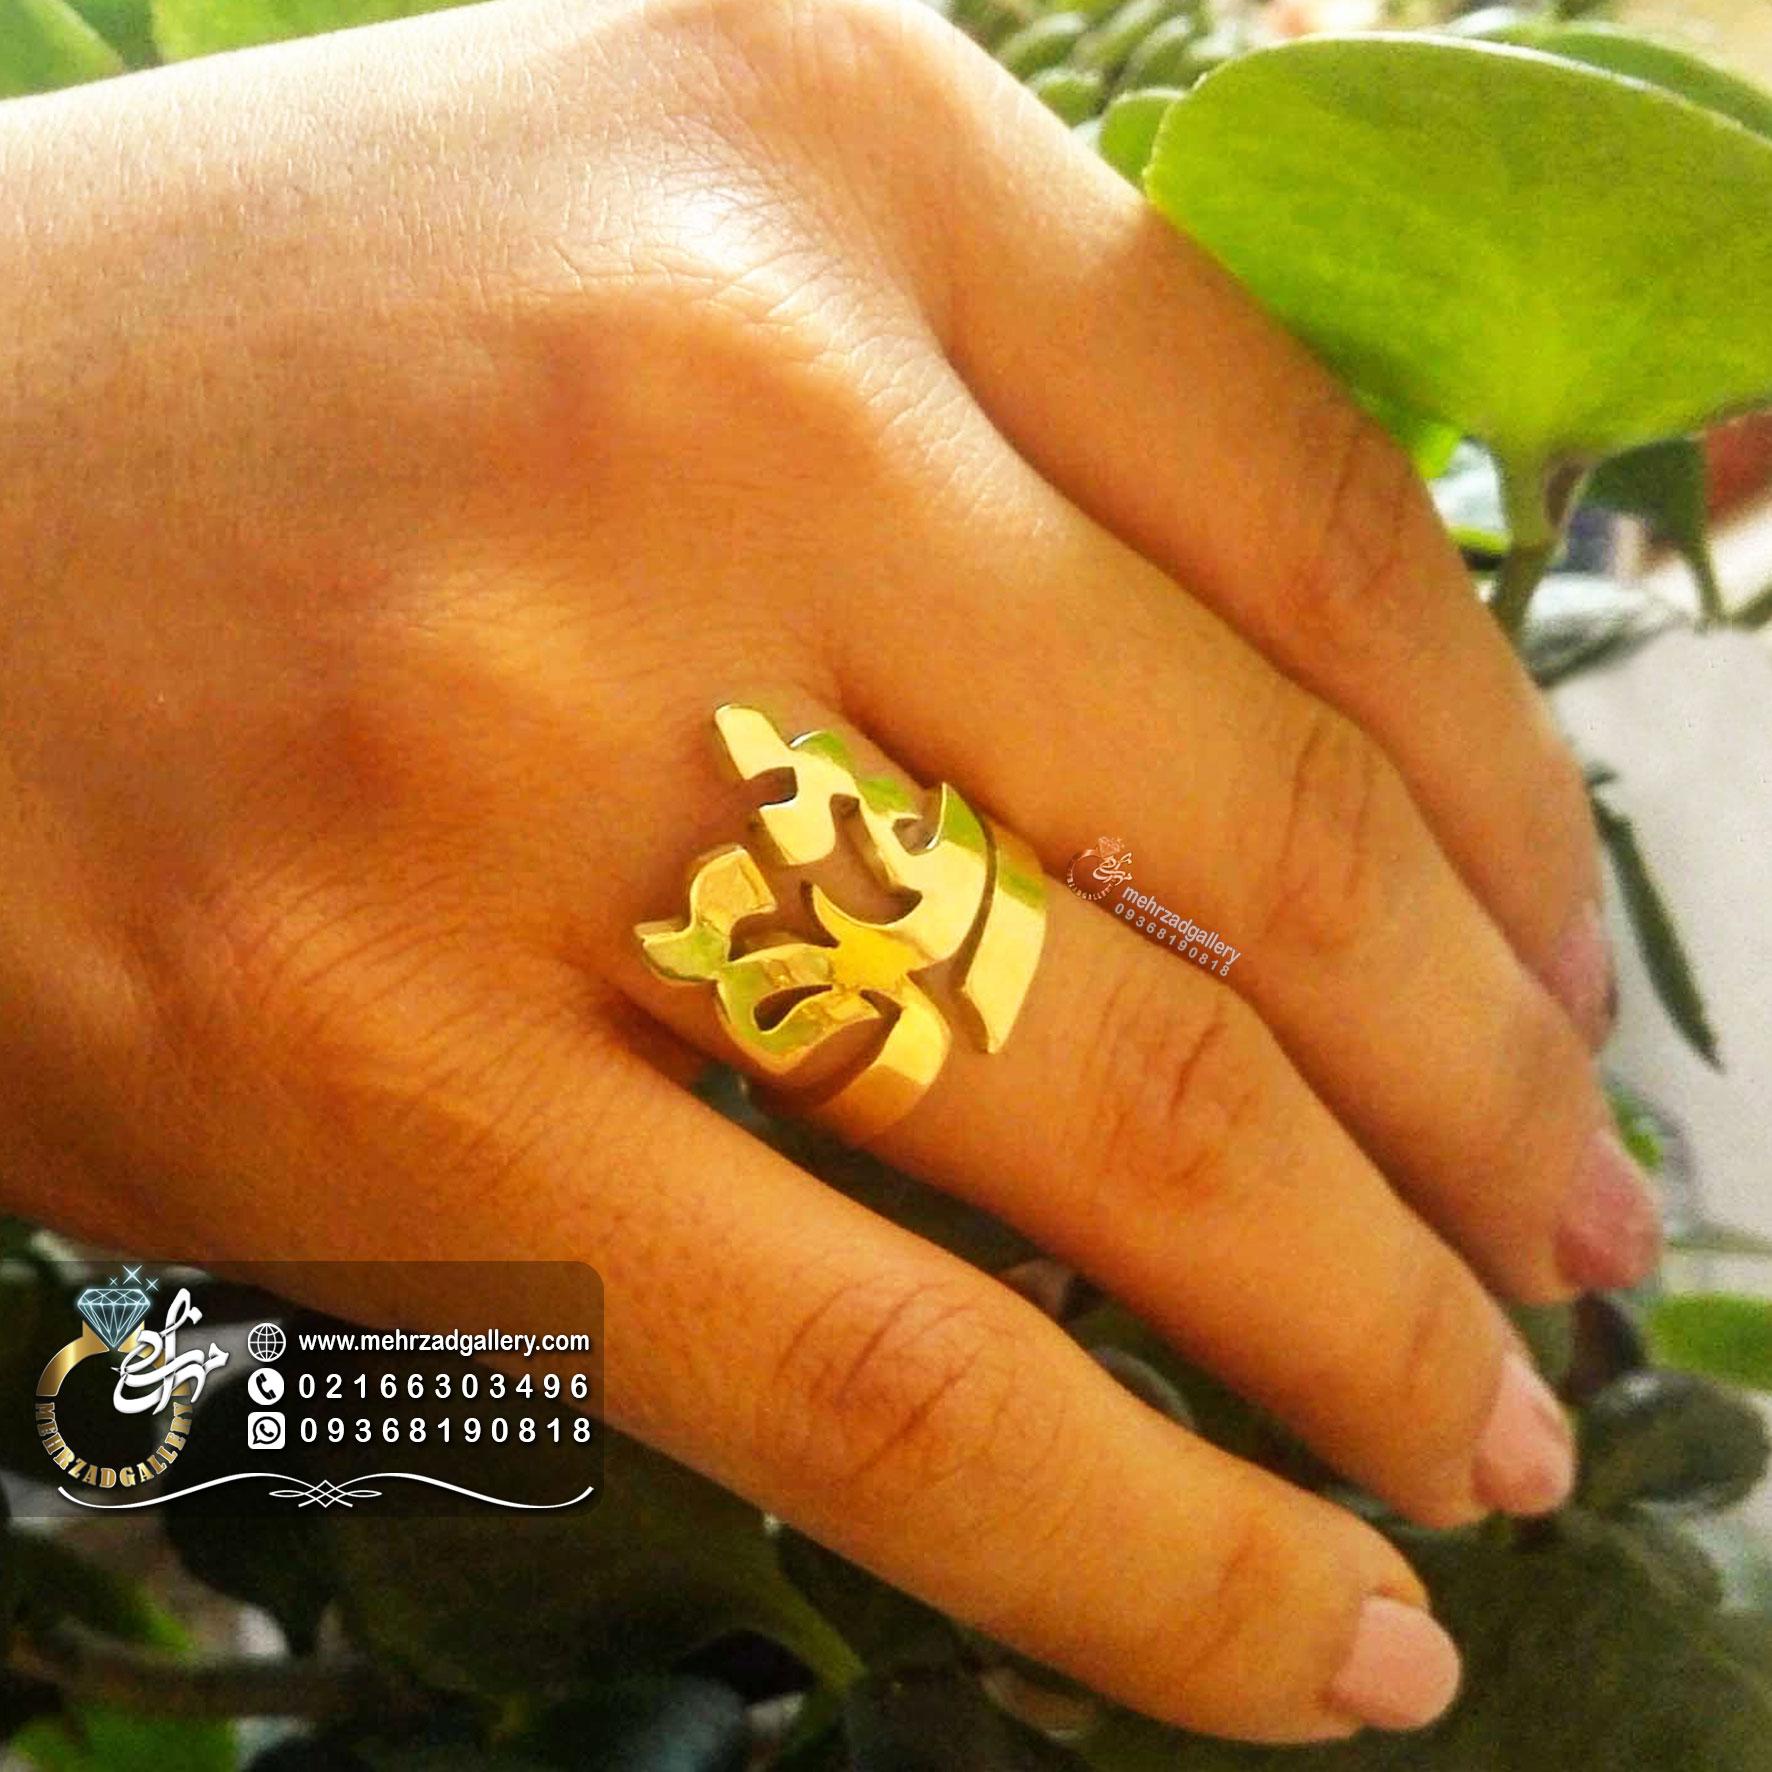 انگشتر طلا اسم عشق ولنتاین زیبا